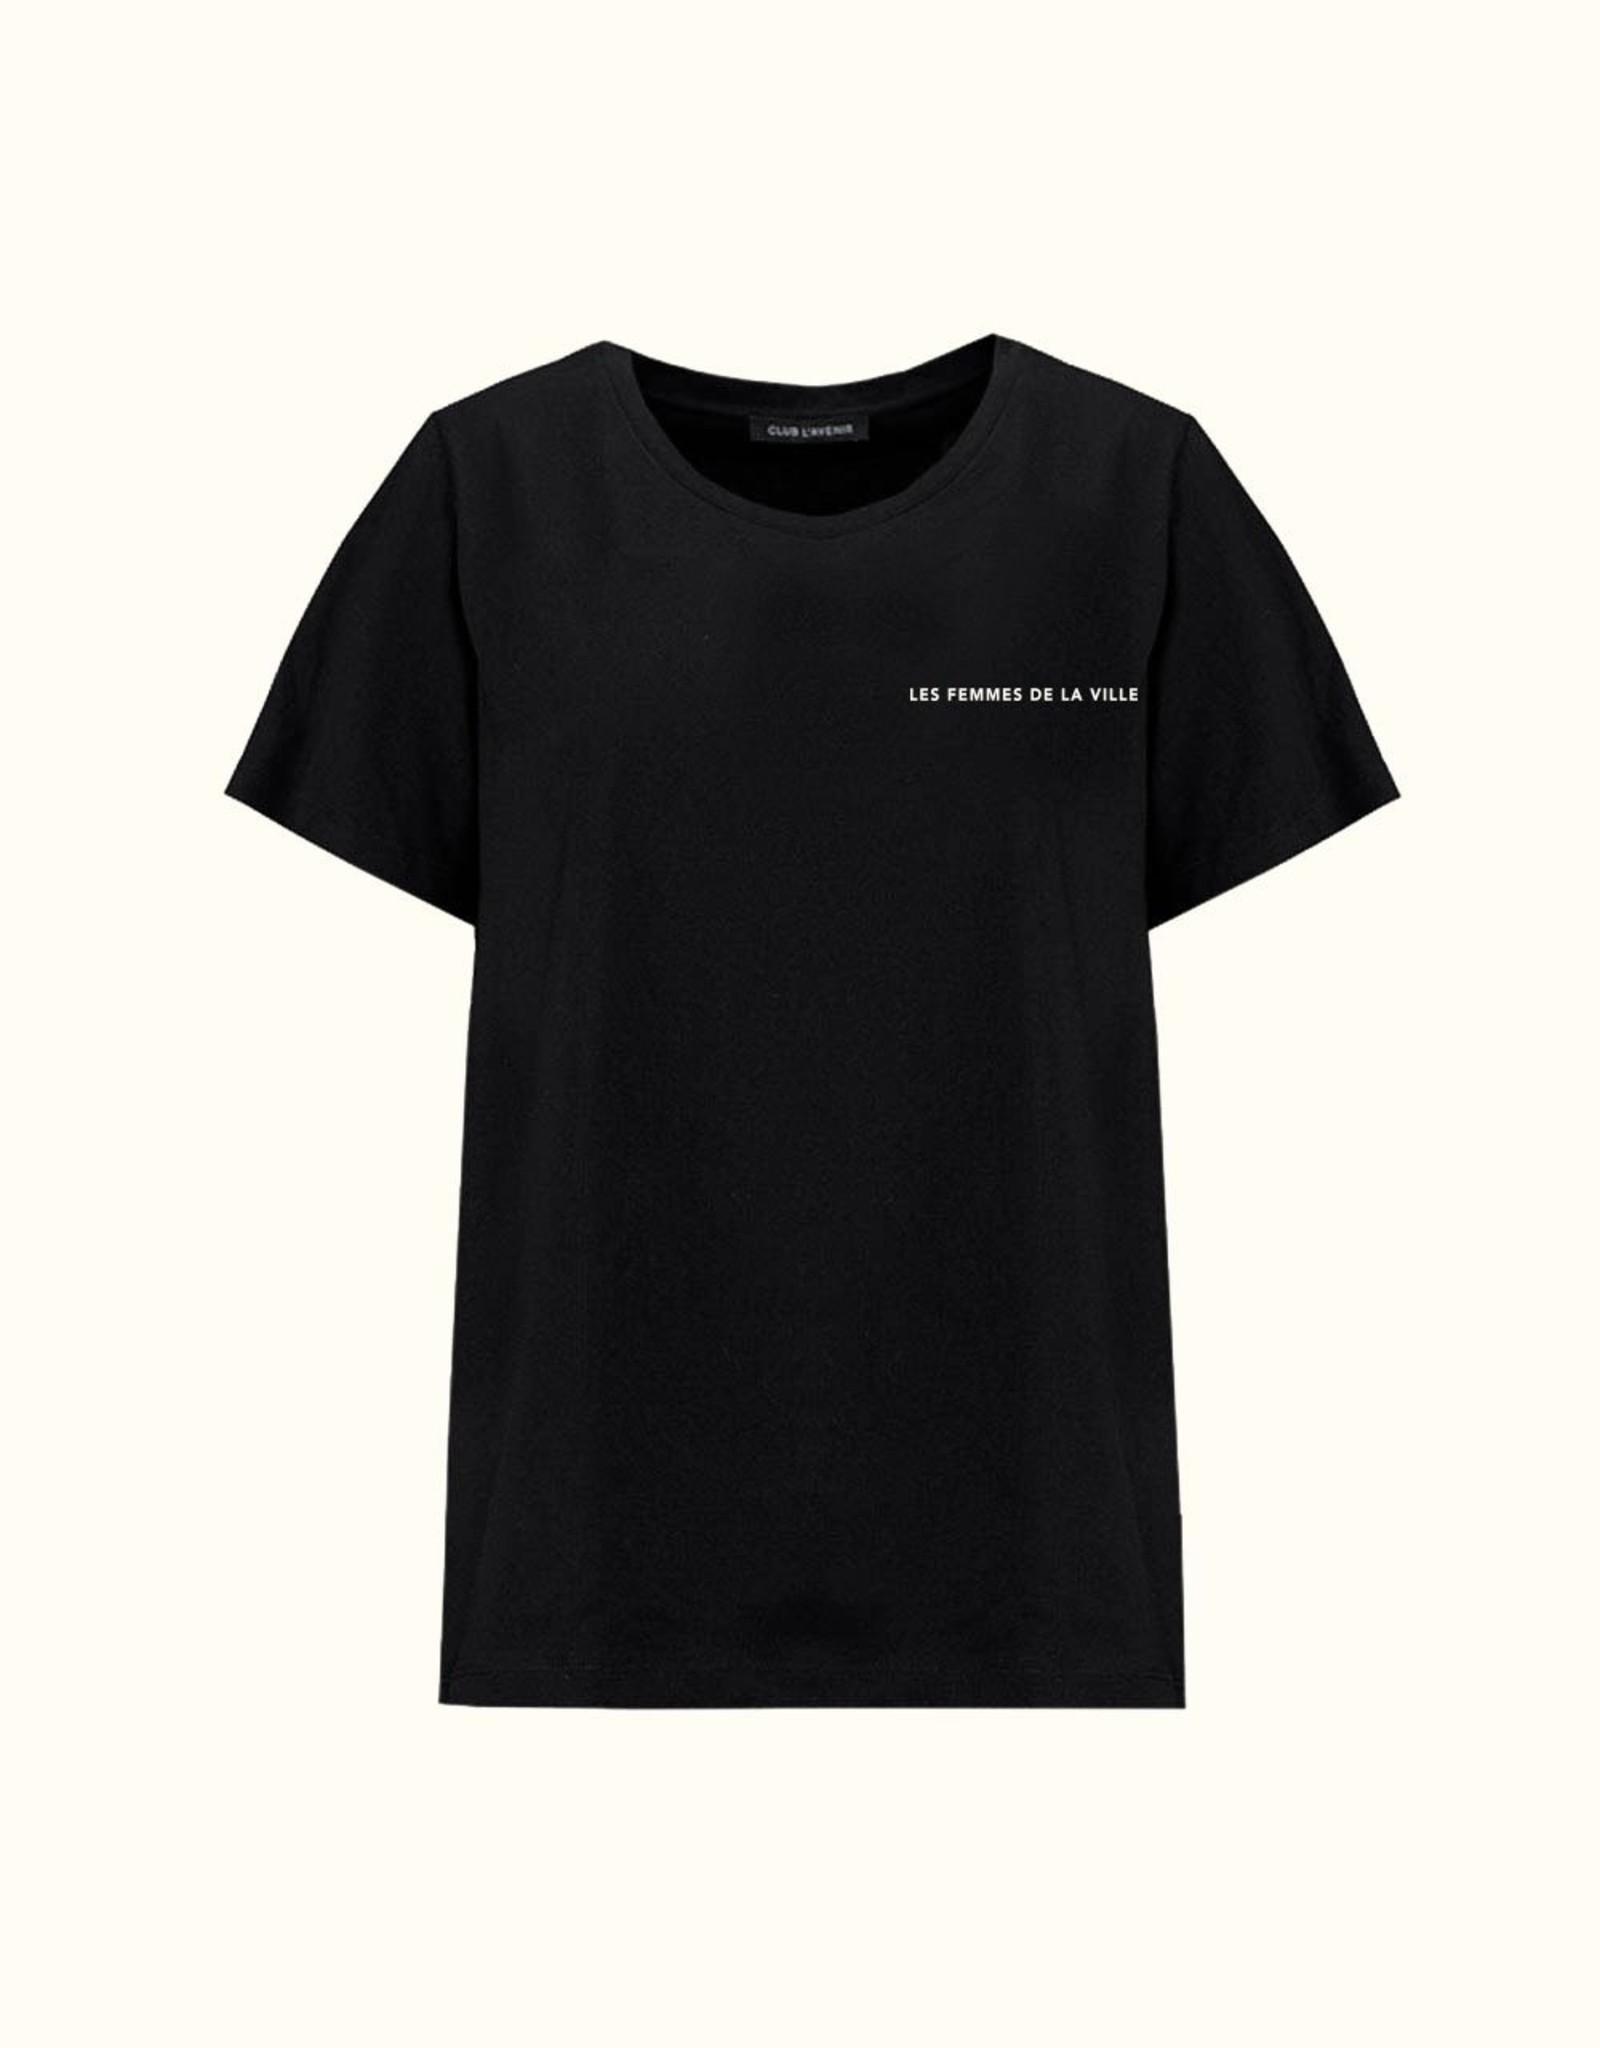 Club l'Avenir Club Tee Black